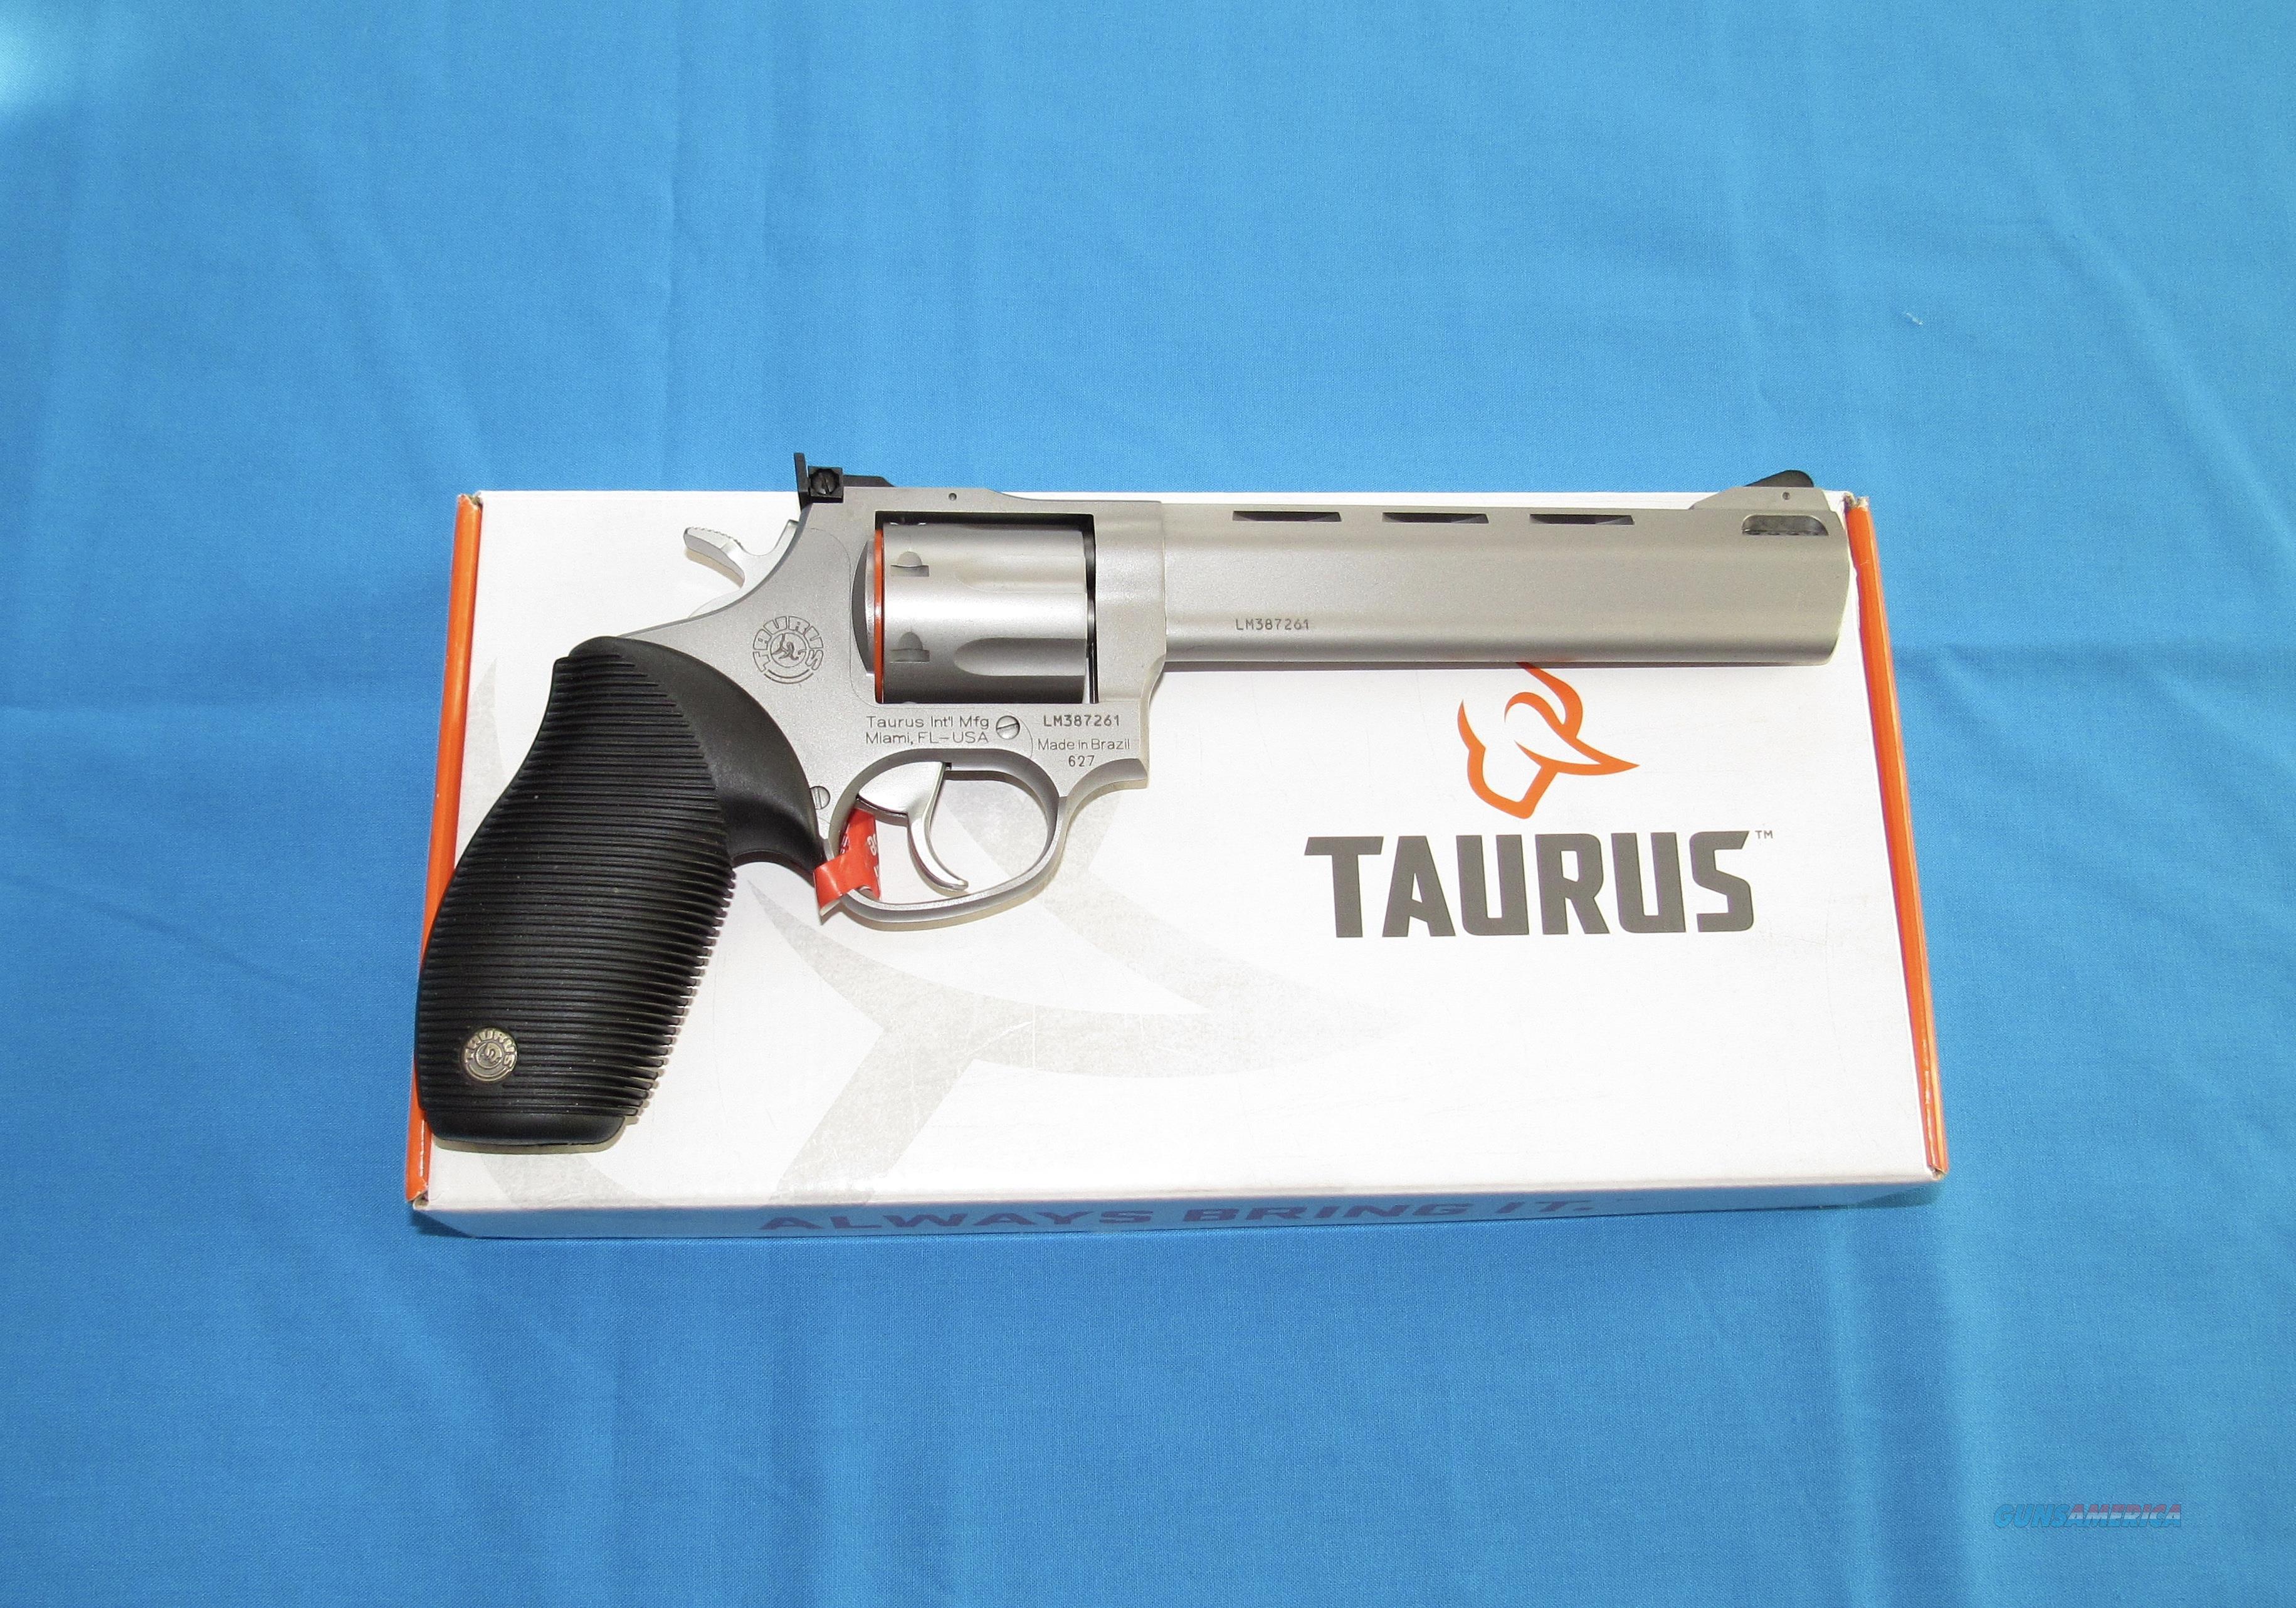 TAURUS 627 TRACKER STAINLESS STEEL 357 MAGNUM REVOLVER  Guns > Pistols > Taurus Pistols > Revolvers